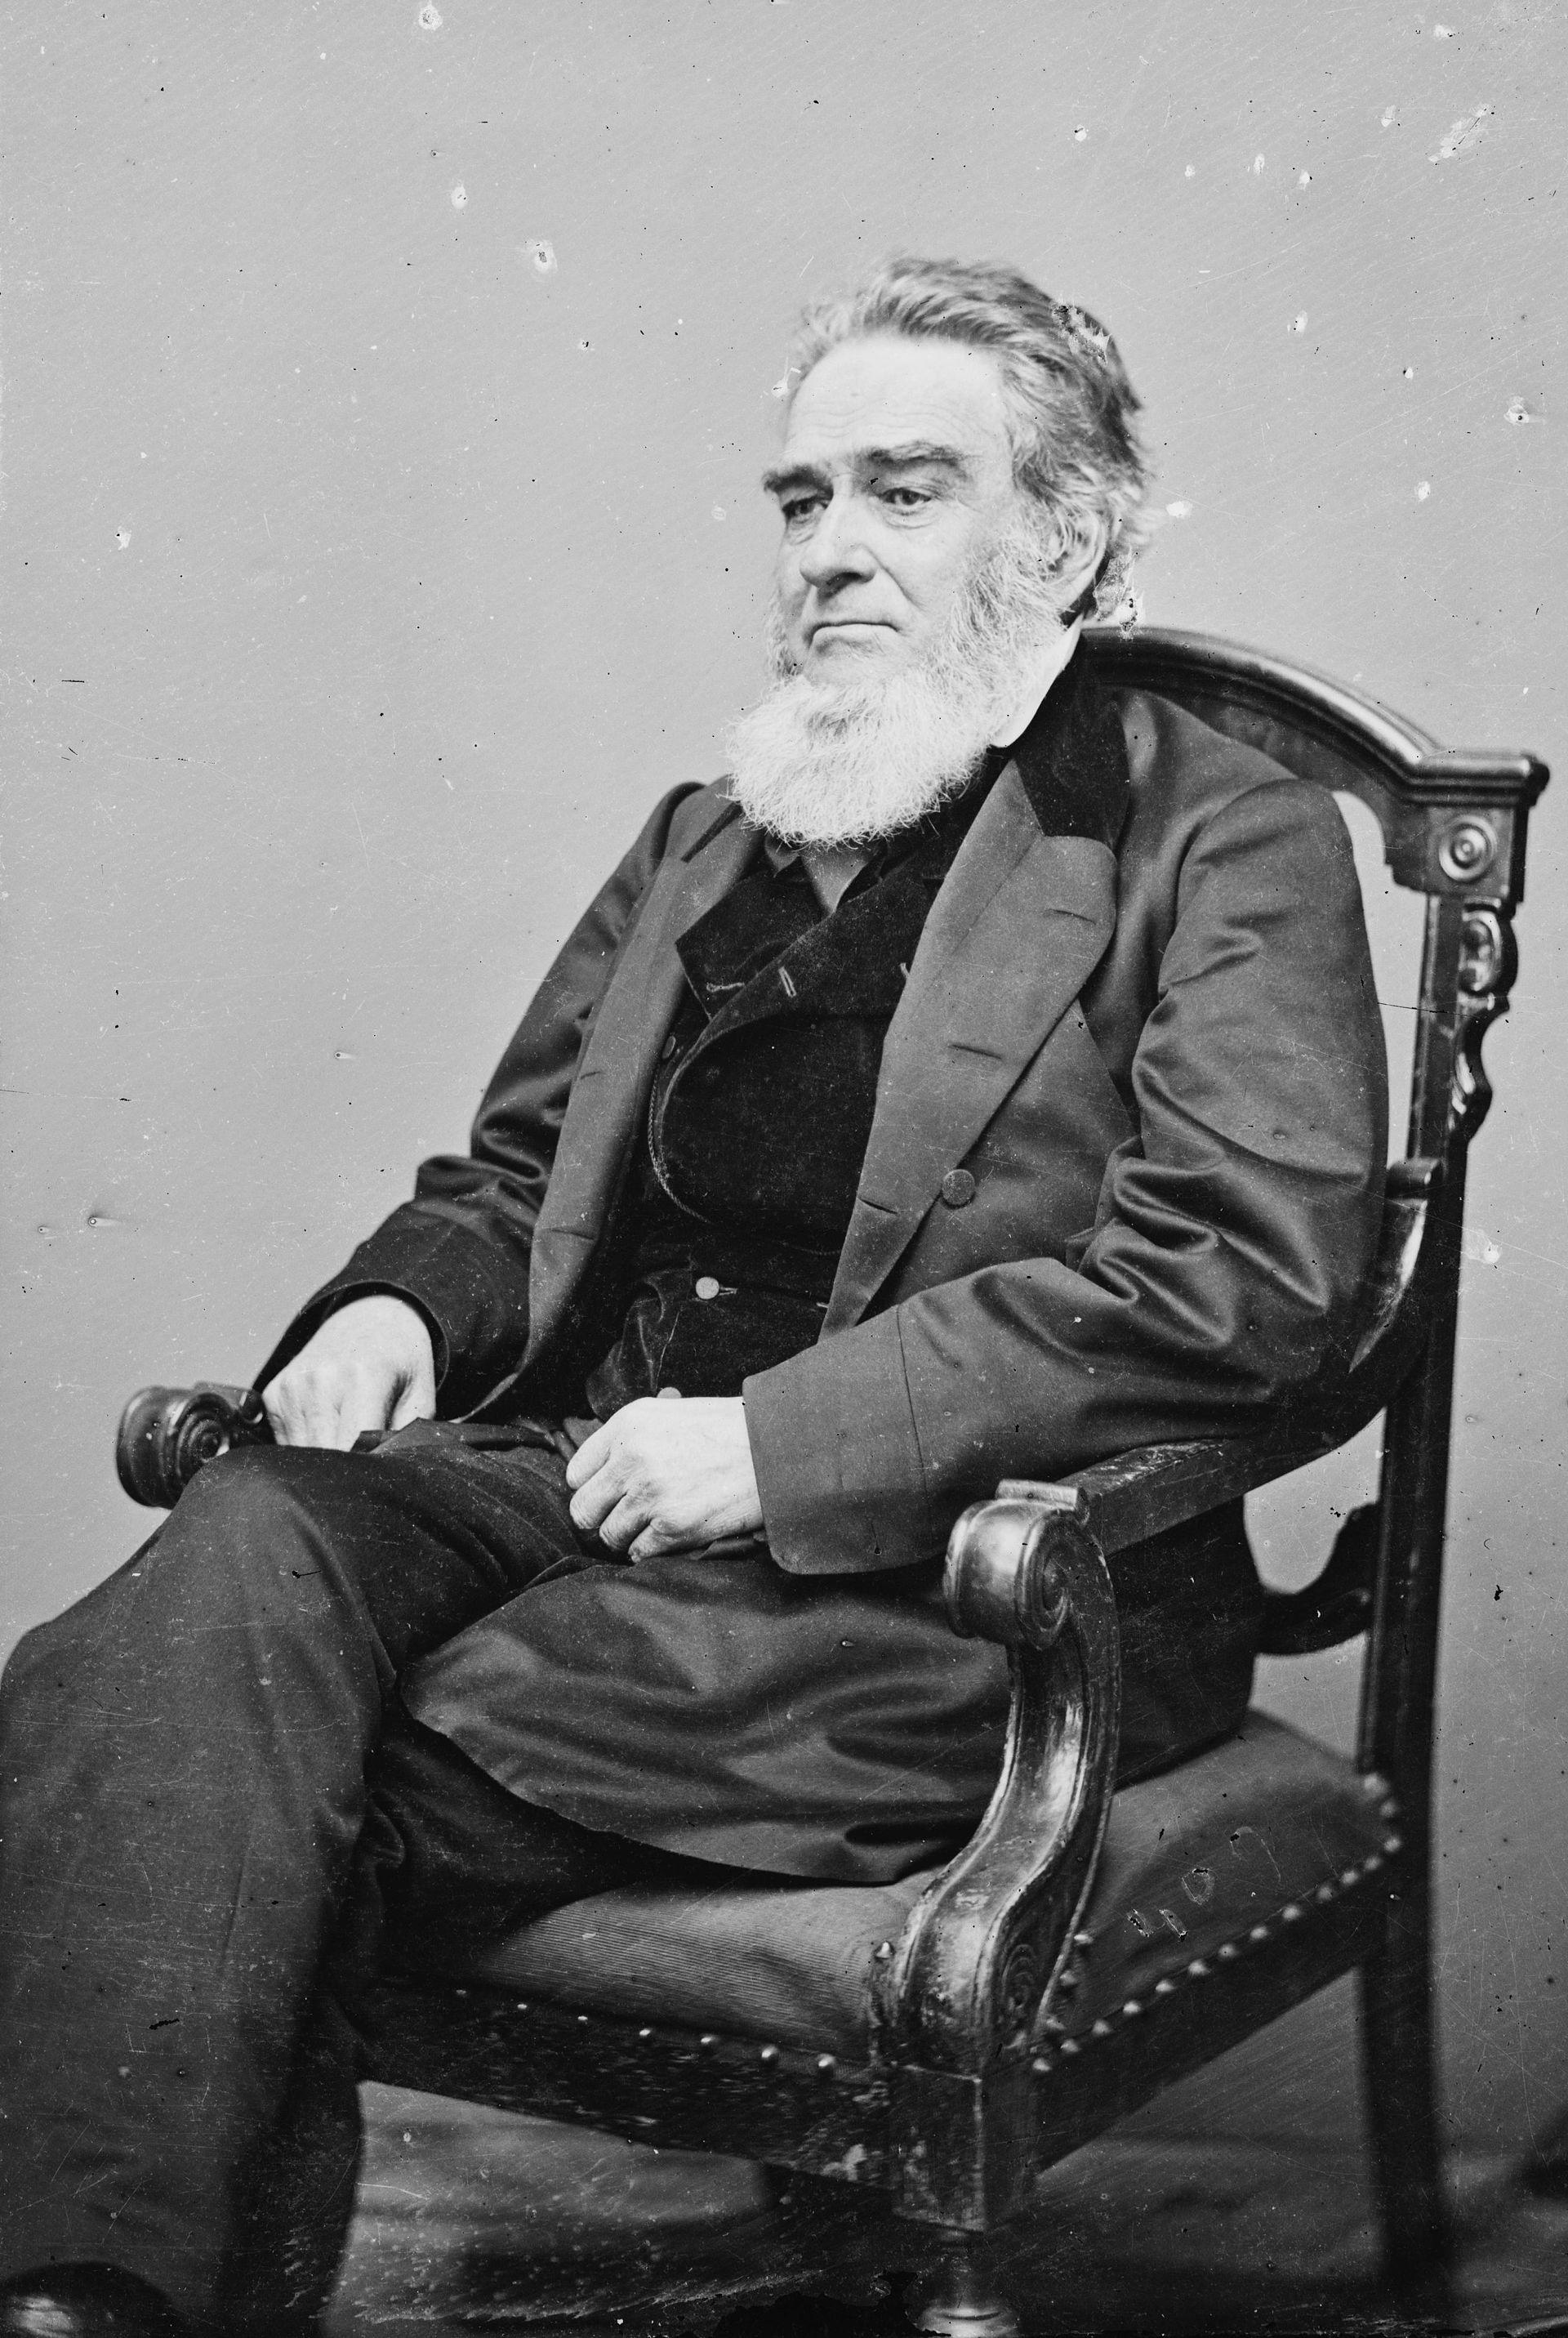 shenandoah beard wikipedia